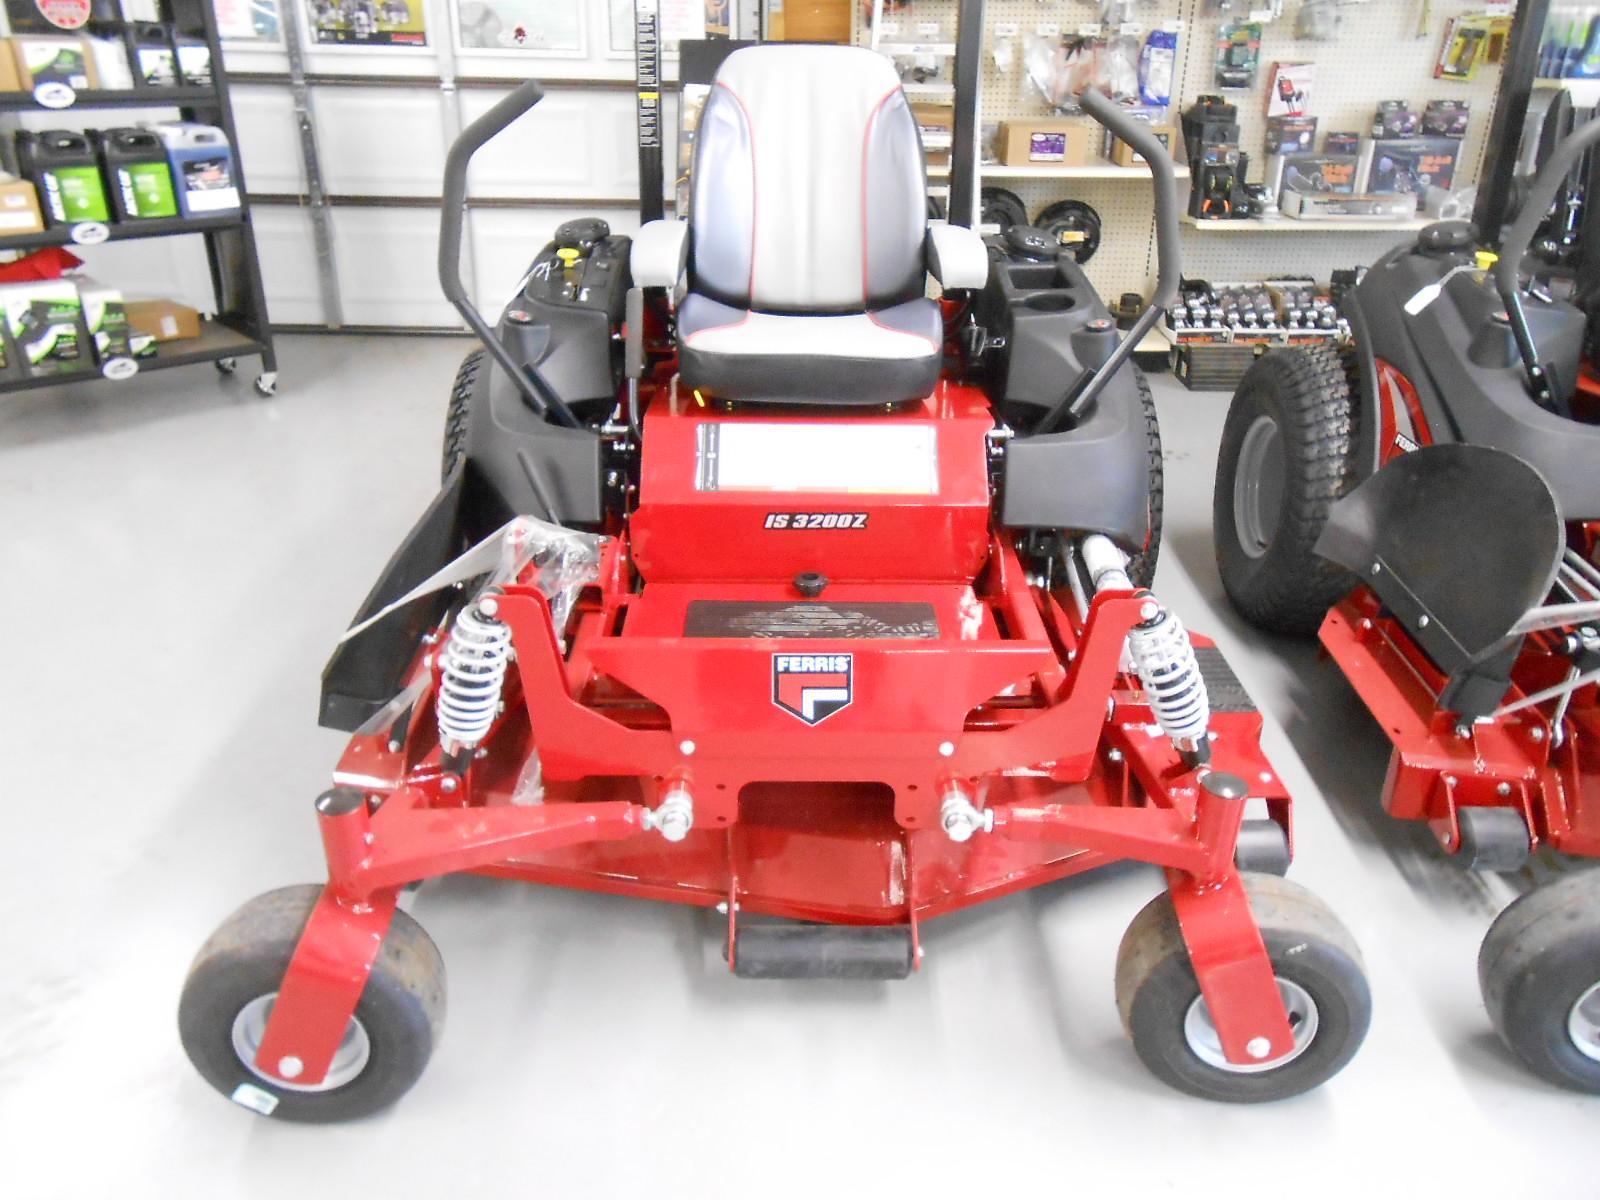 Ferris IS 3200 Z Zero Turn Mower 37hp Vanguard Big Block EFI Oil Guard 61